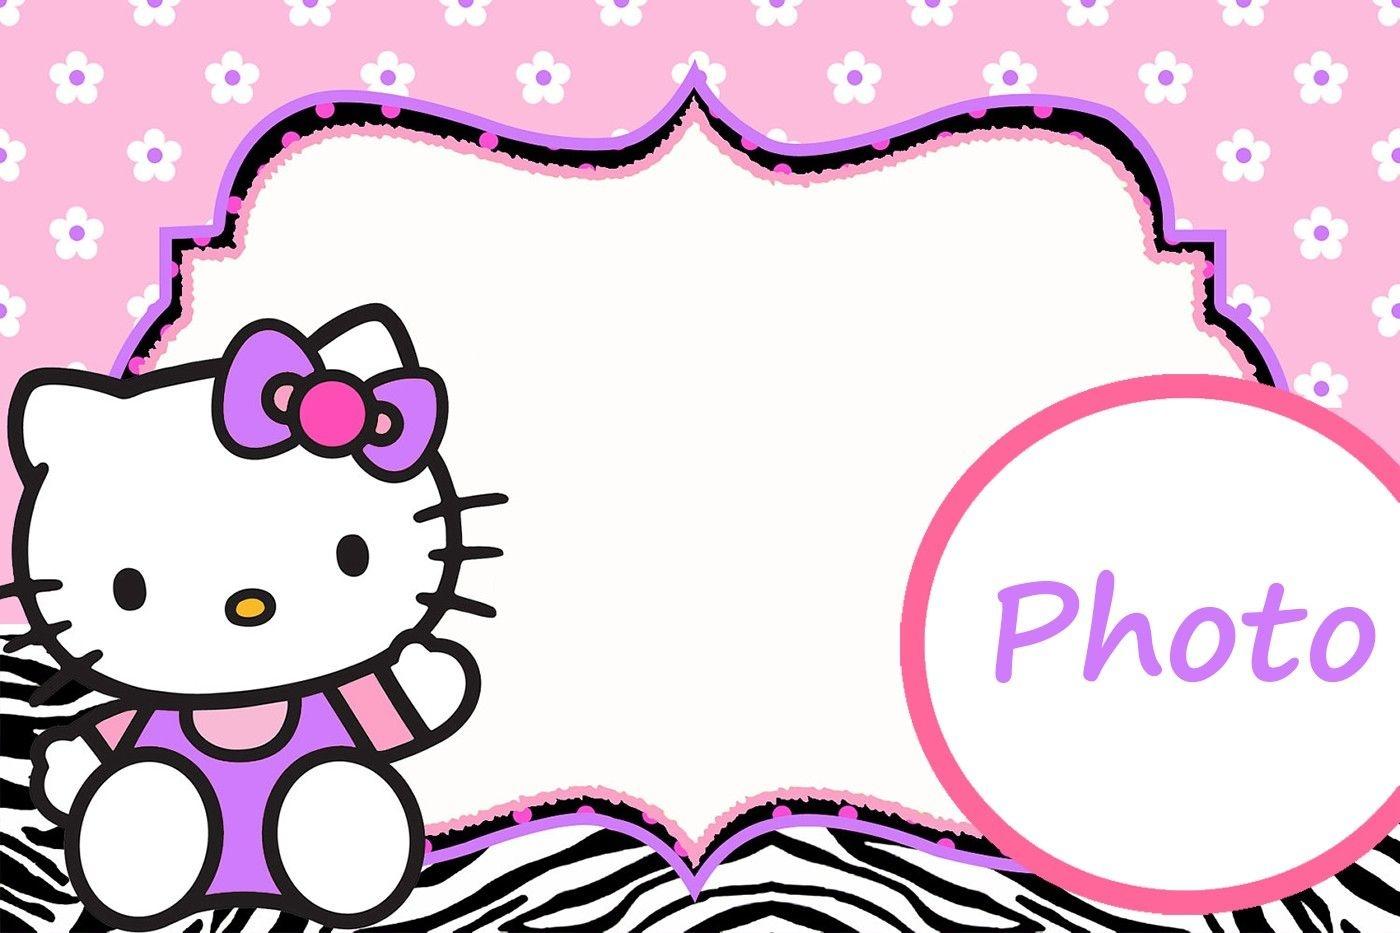 Personalized Hello Kitty Invitation Template | Hello Kitty | Hello - Hello Kitty Name Tags Printable Free